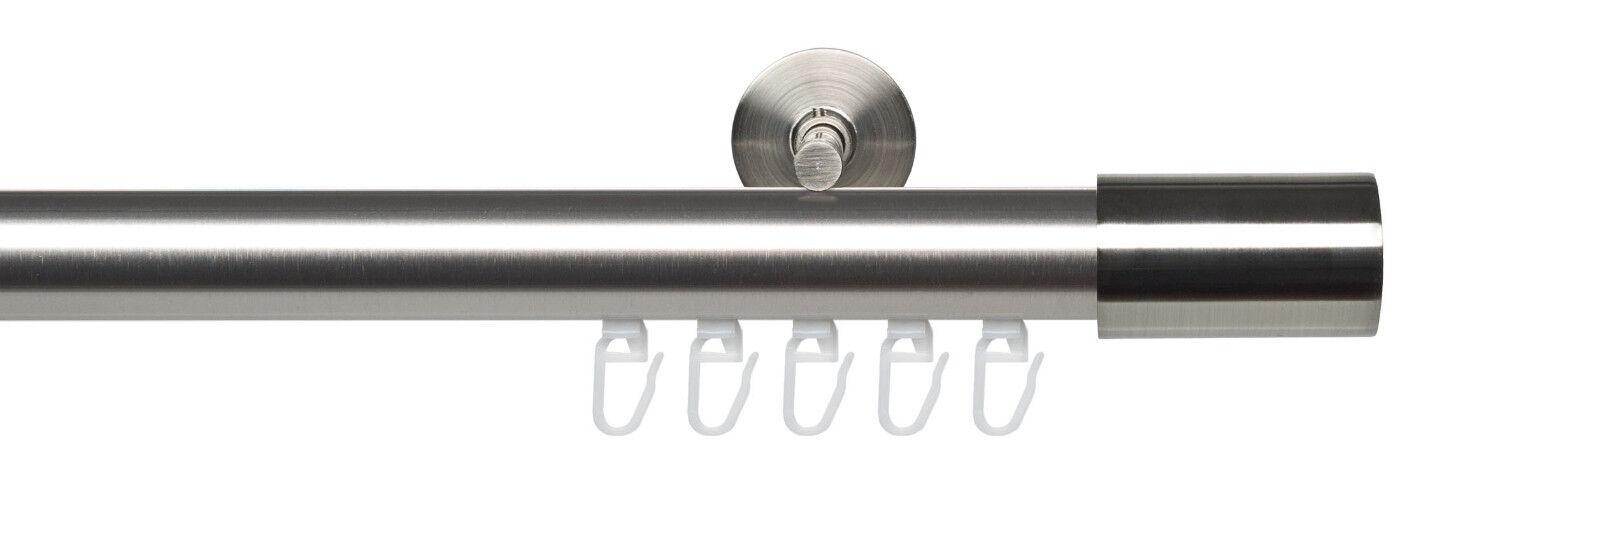 Gardinenstange Innenlauf 1 läufig Vorhangstange Metall Metall Metall Silber Edelstahl-Optik 28b459